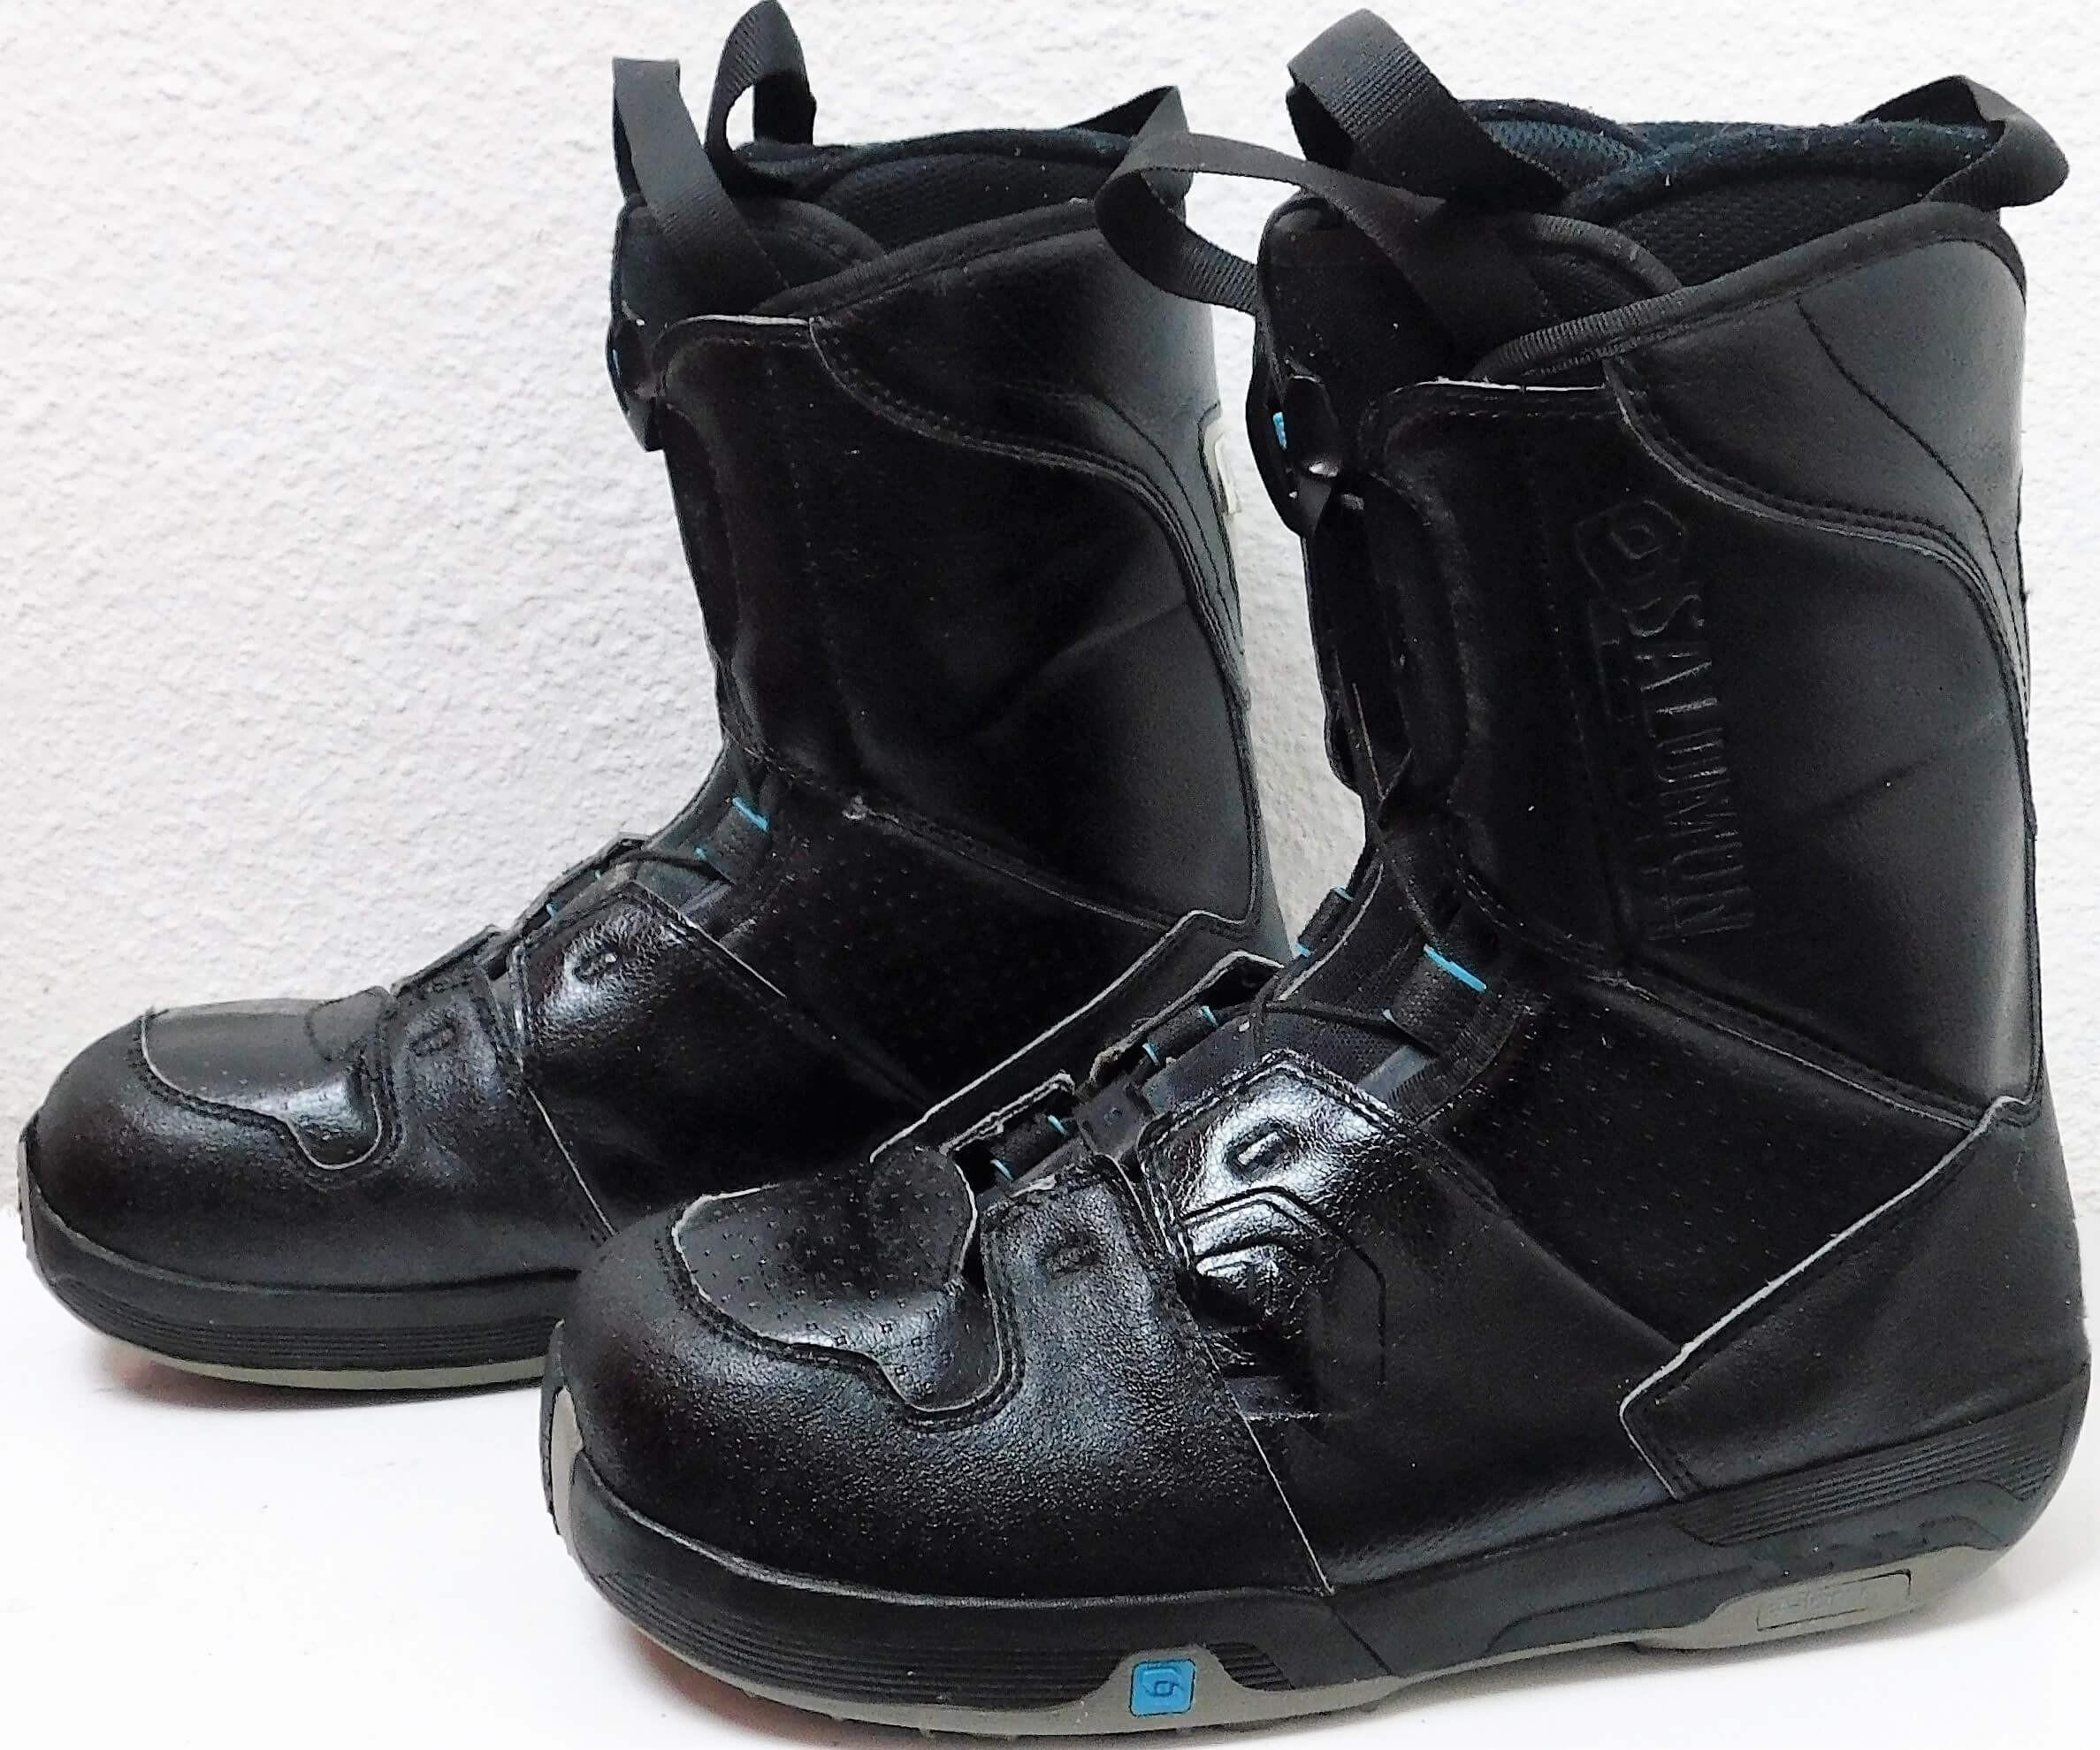 Boots De Snowboard Salomon Kamooks